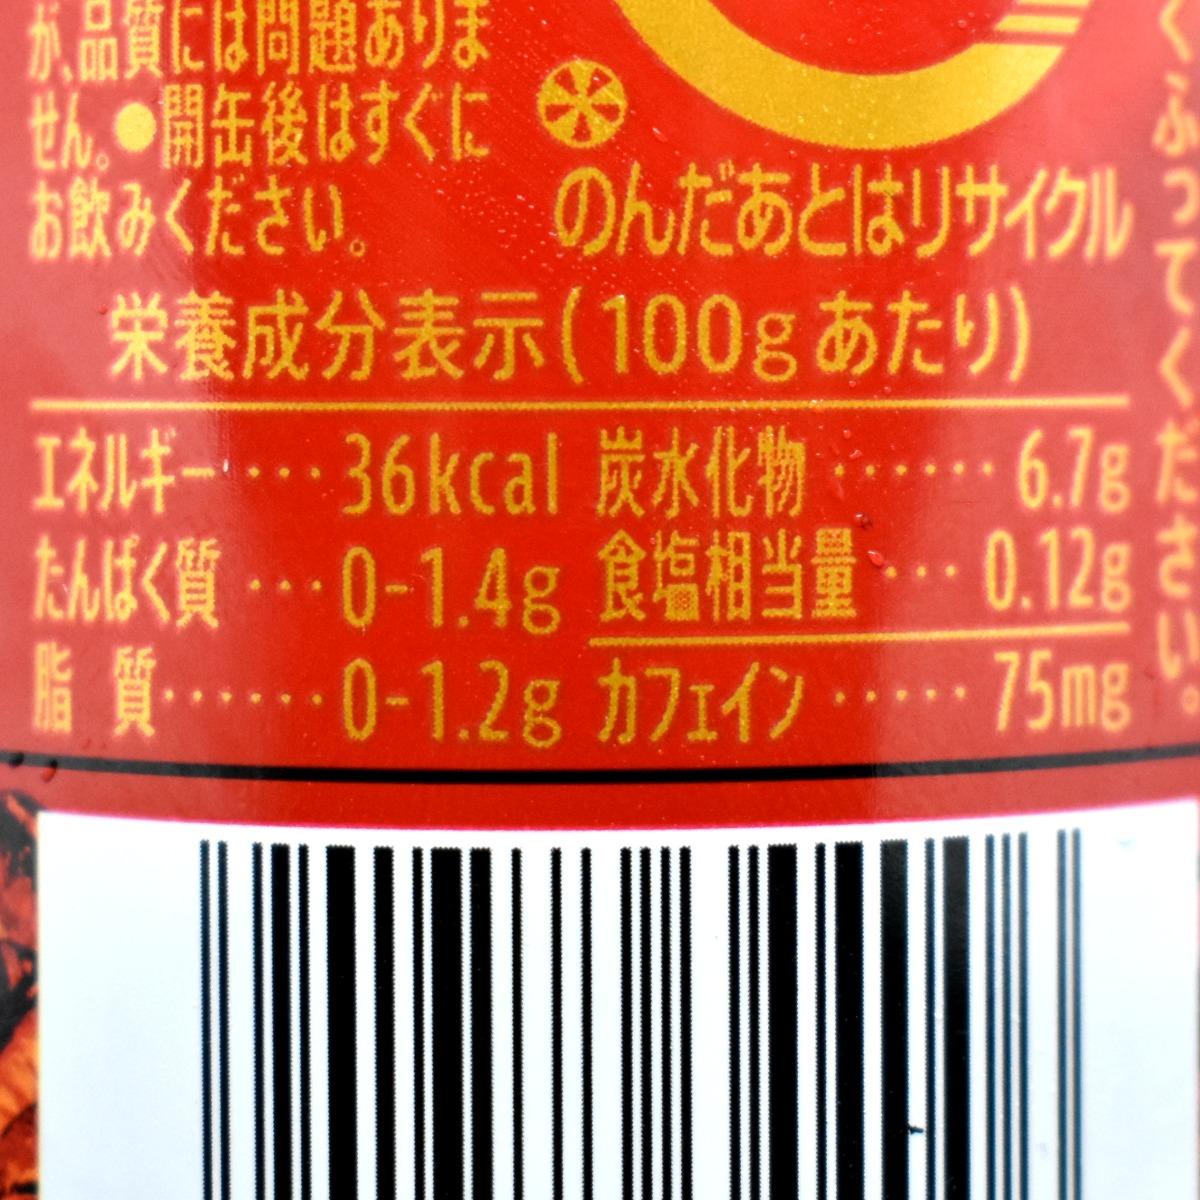 BOSS ボス レインボーマウンテン ビターの栄養成分表示